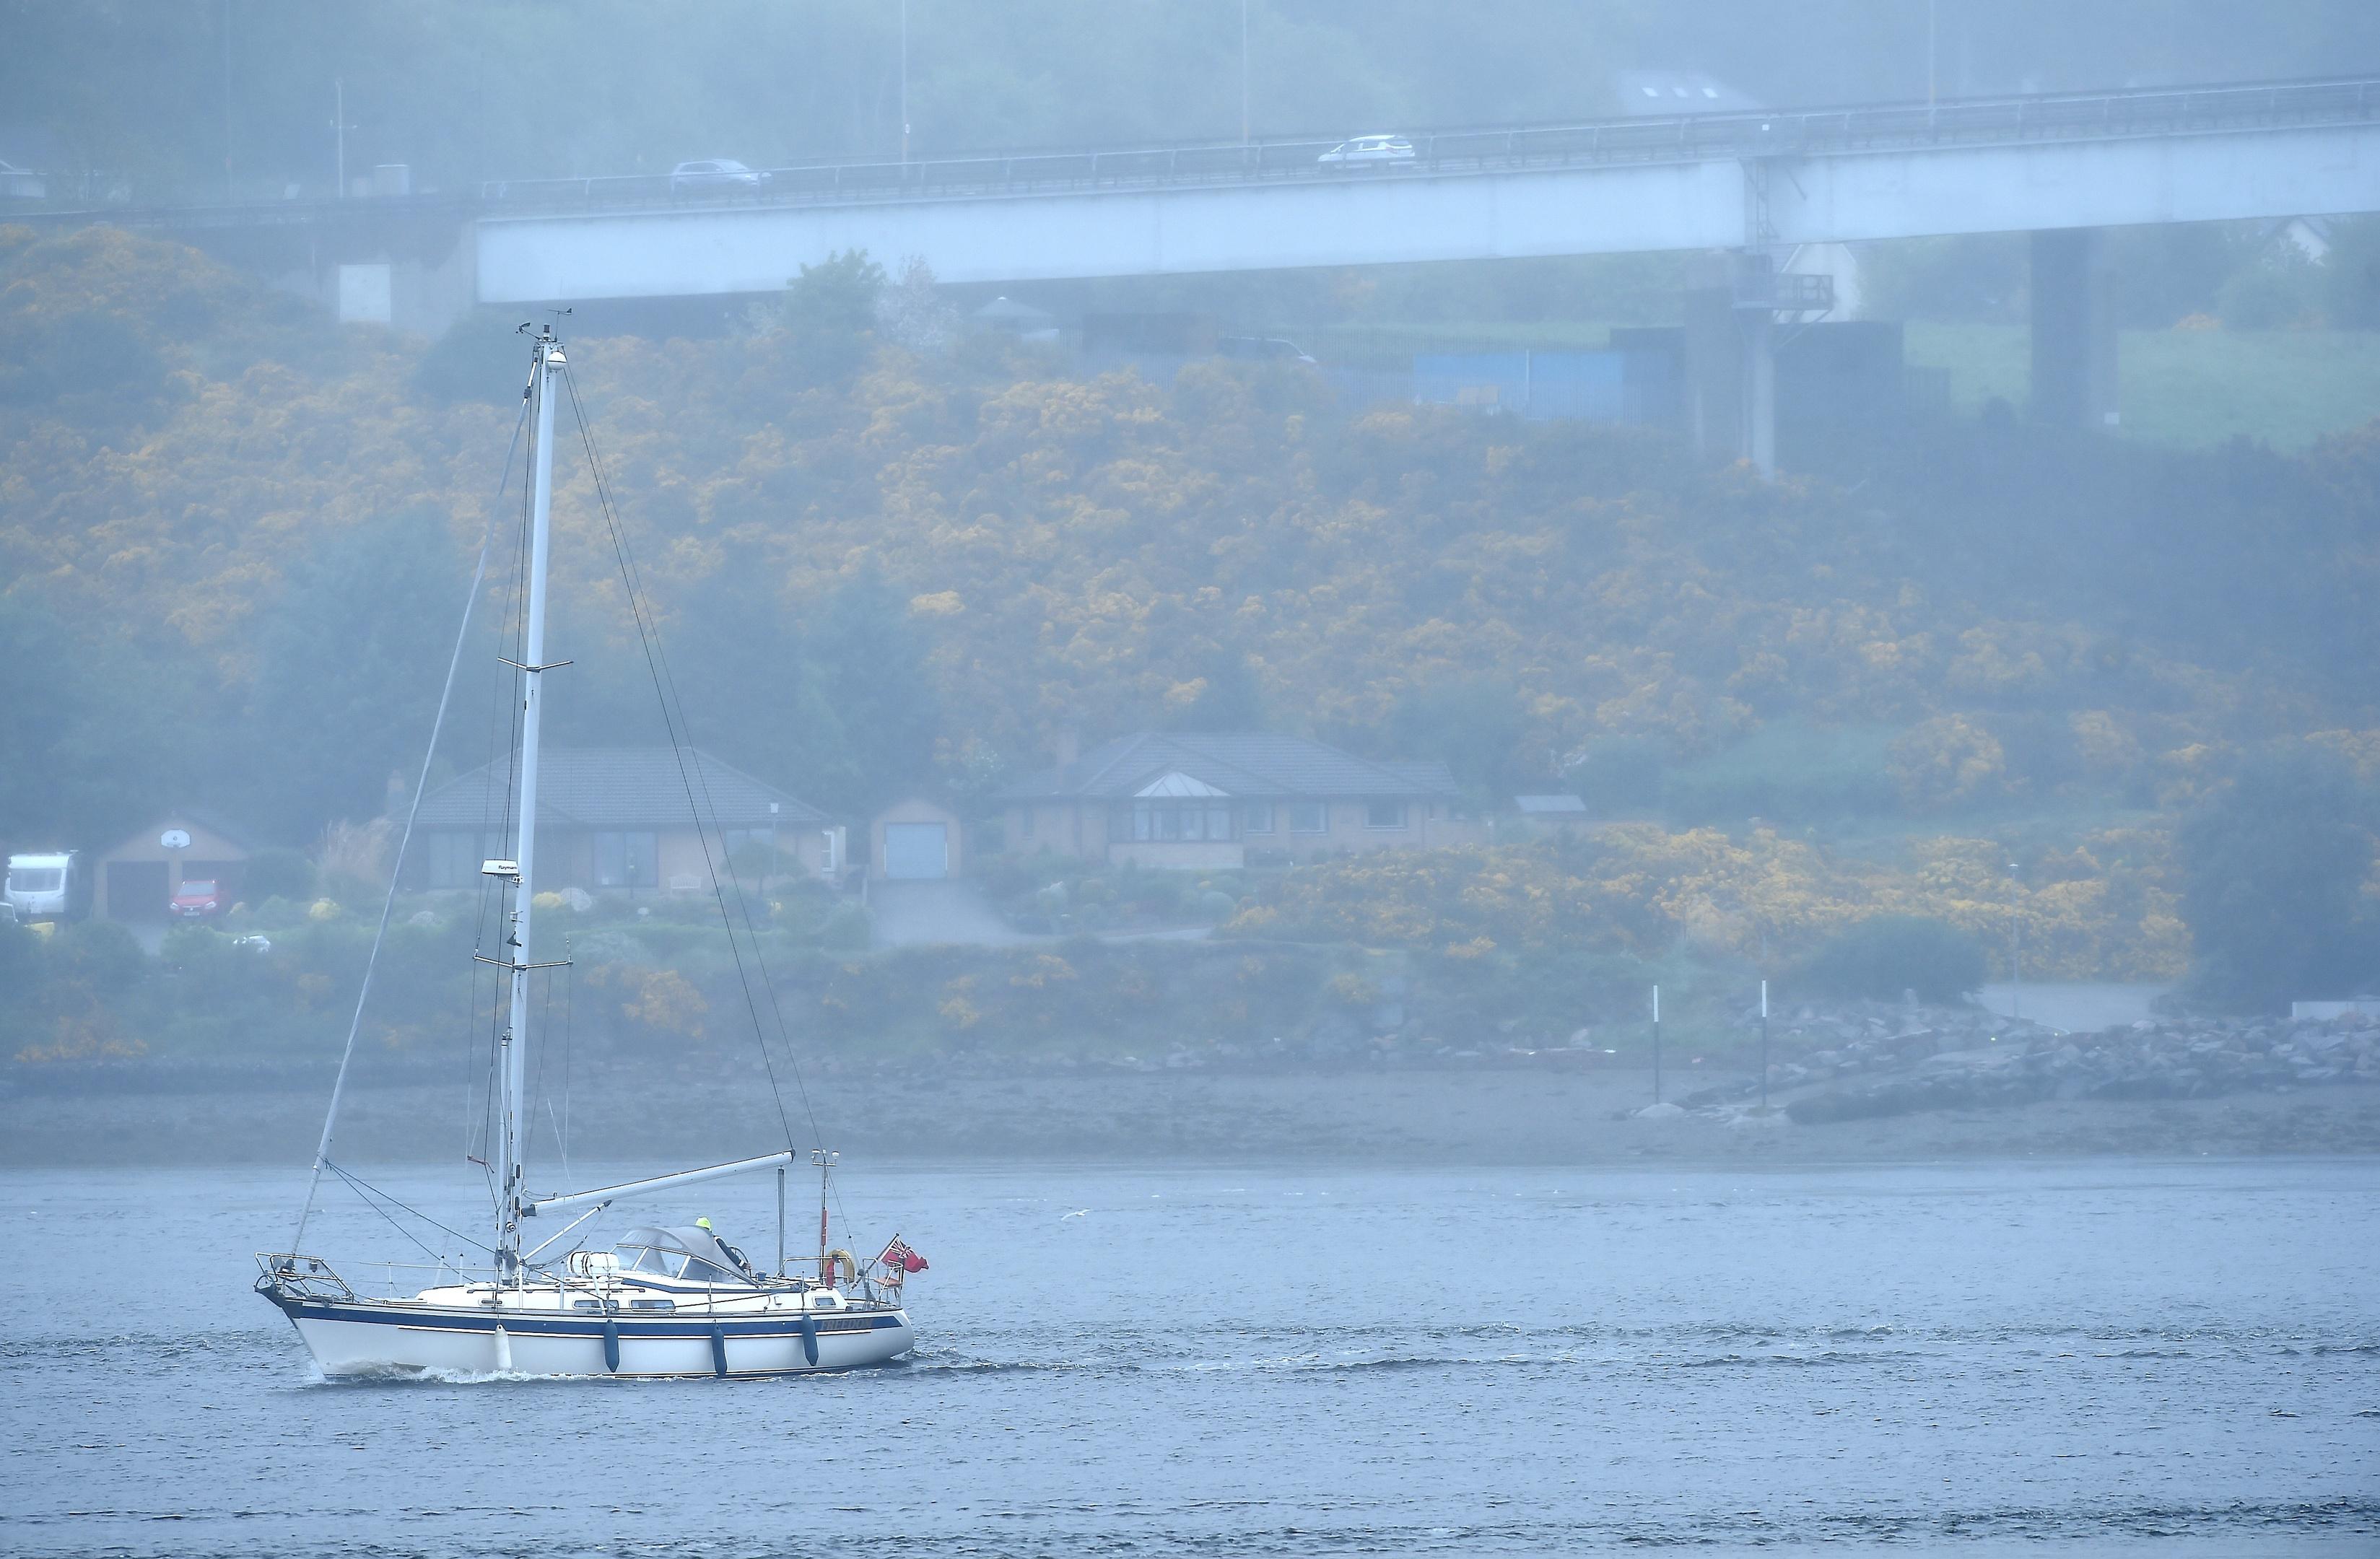 The yacht making its way past the Kessock Bridge.